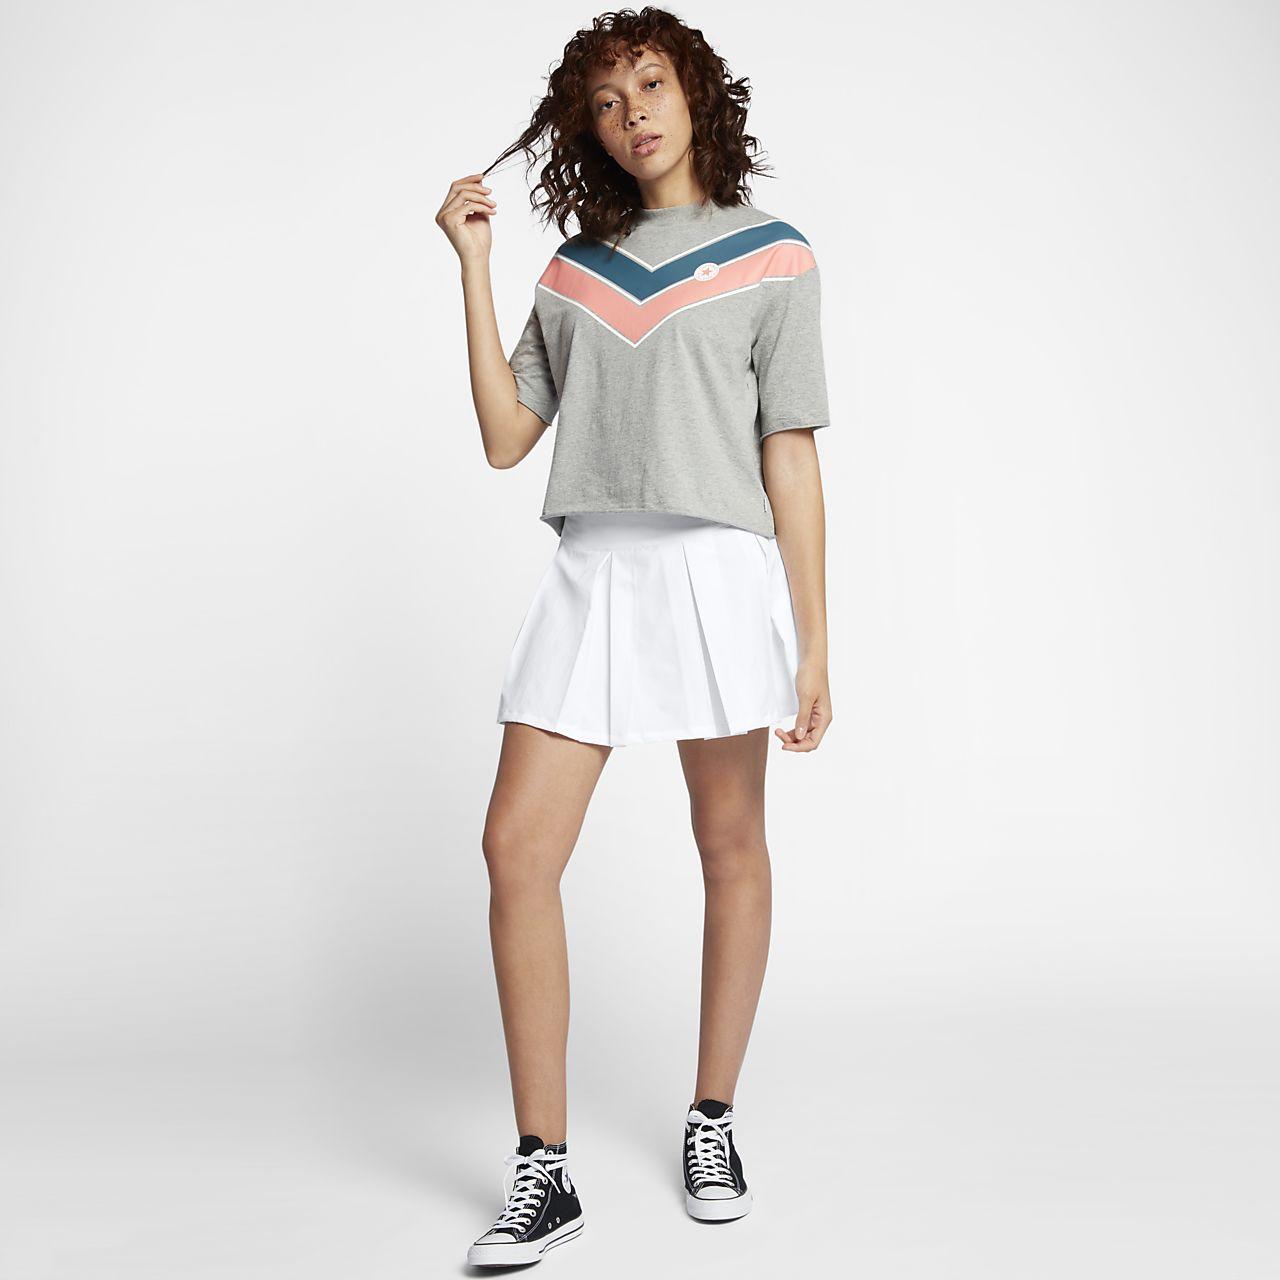 converse tennis